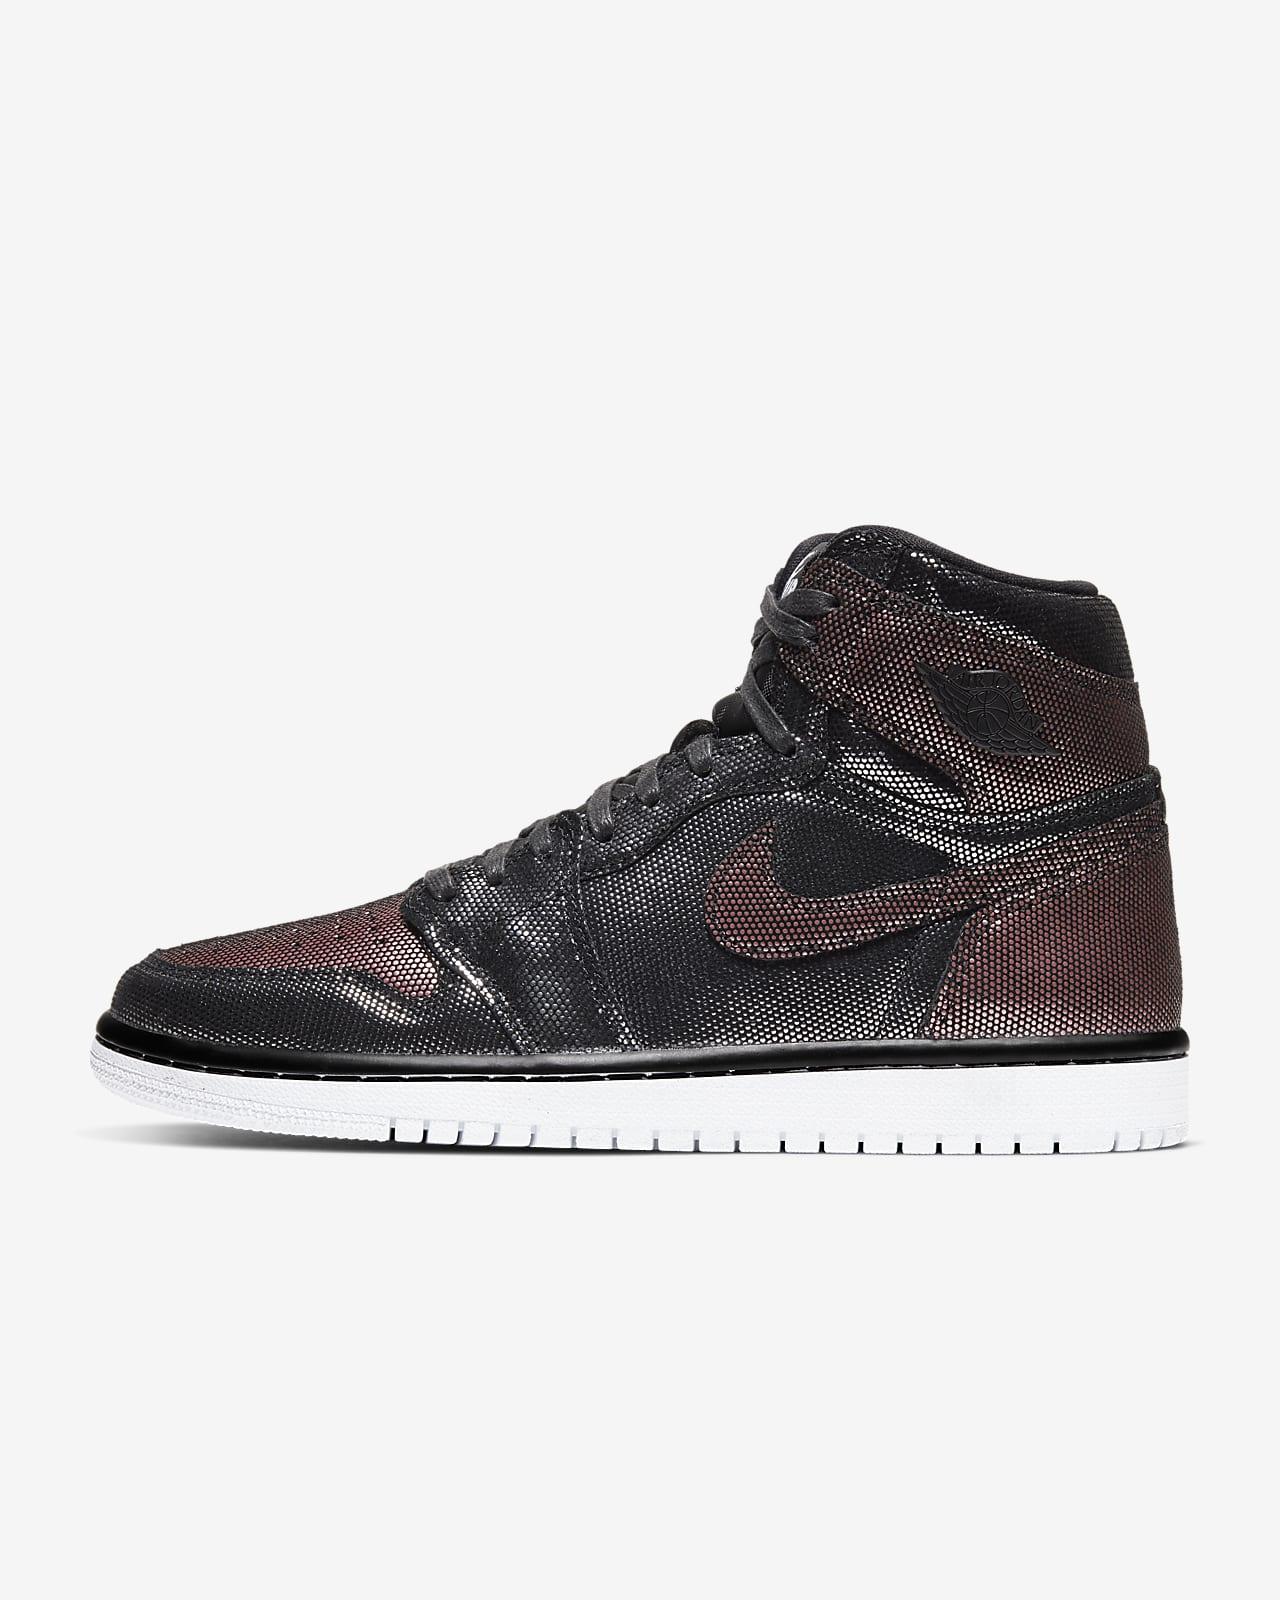 Air Jordan 1 Hi OG Fearless Zapatillas - Mujer